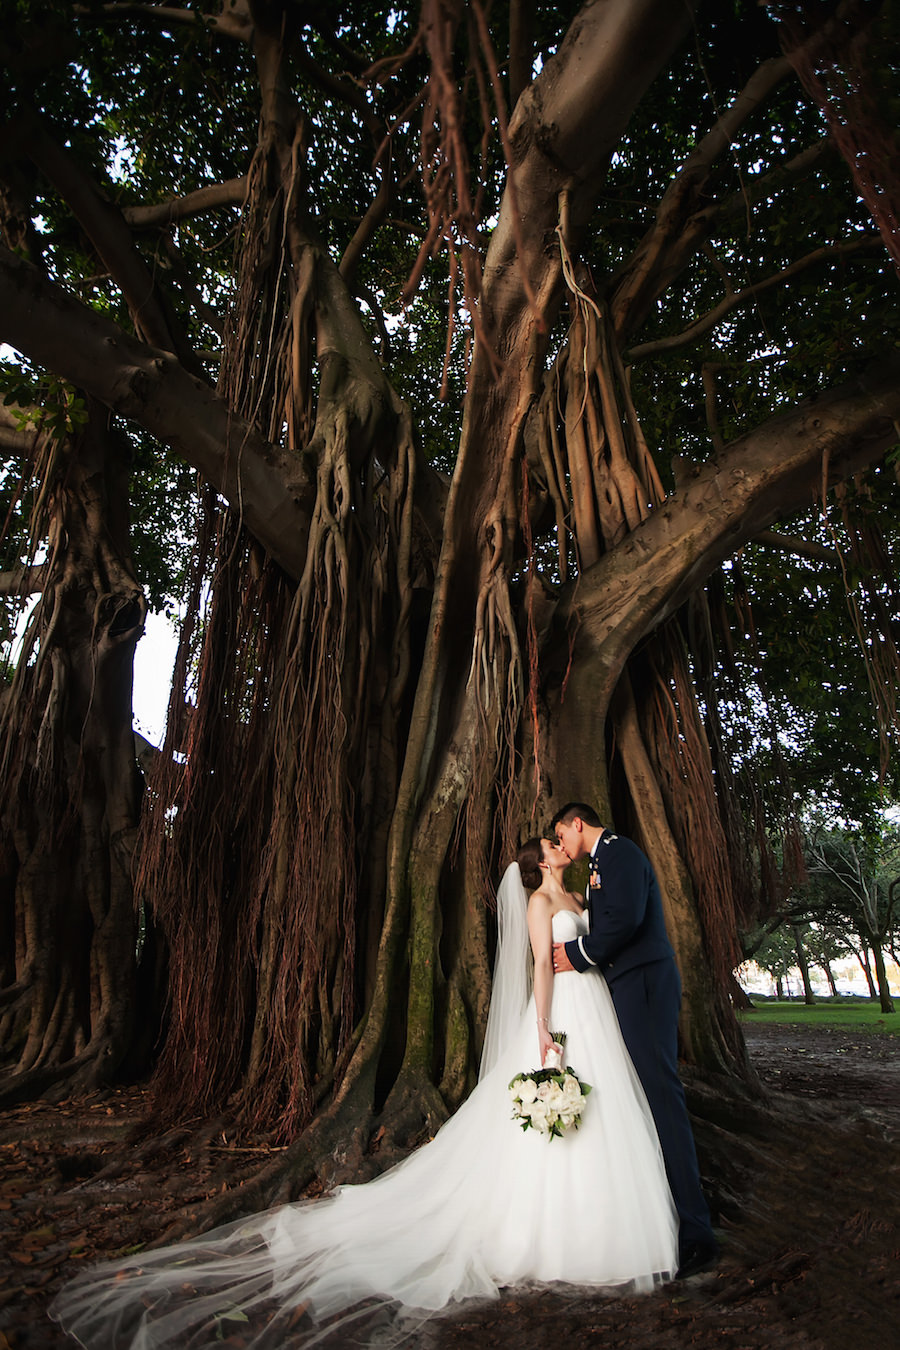 Bride and Groom Outdoor Vinoy Park Wedding Portrait Under Banyan Tree | St. Petersburg Wedding Photographer Limelight Photography